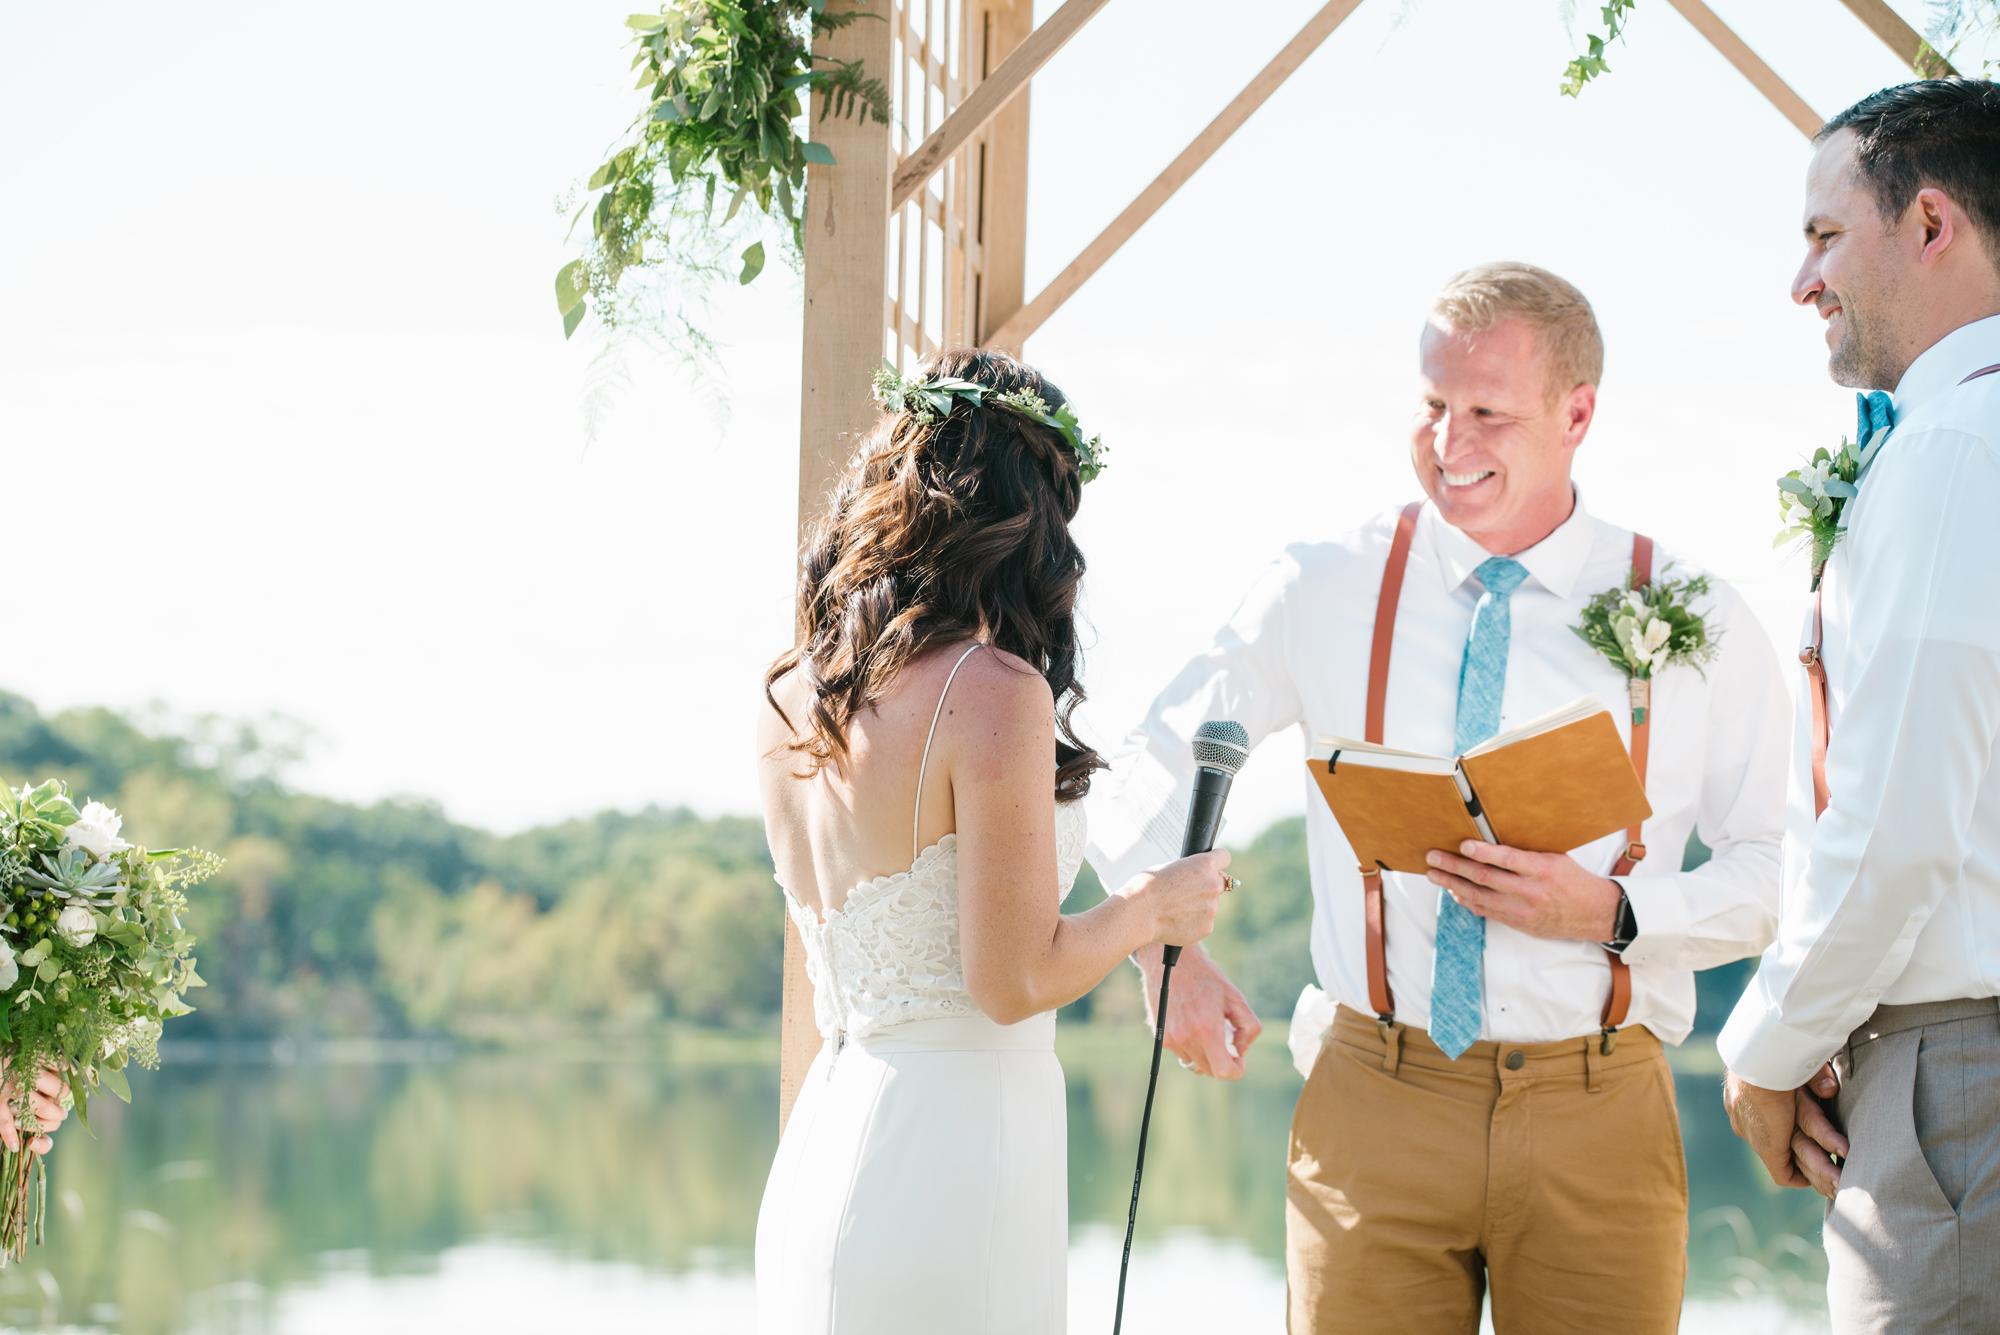 Quincy-Coldwater-Michigan-farm-wedding-photogapher-sydney-marie (151).jpg